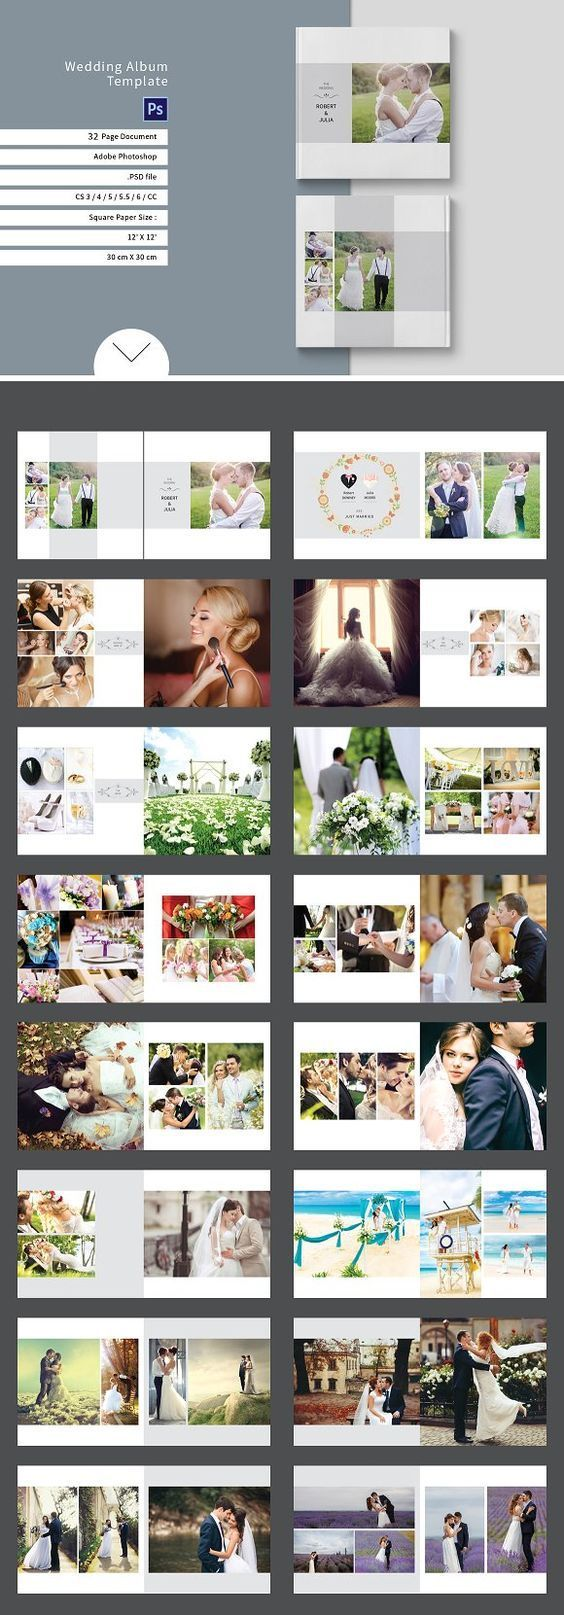 Wedding Album Template Creativework247 Weddingalbums Wedding Album Design Album Design Wedding Photo Albums